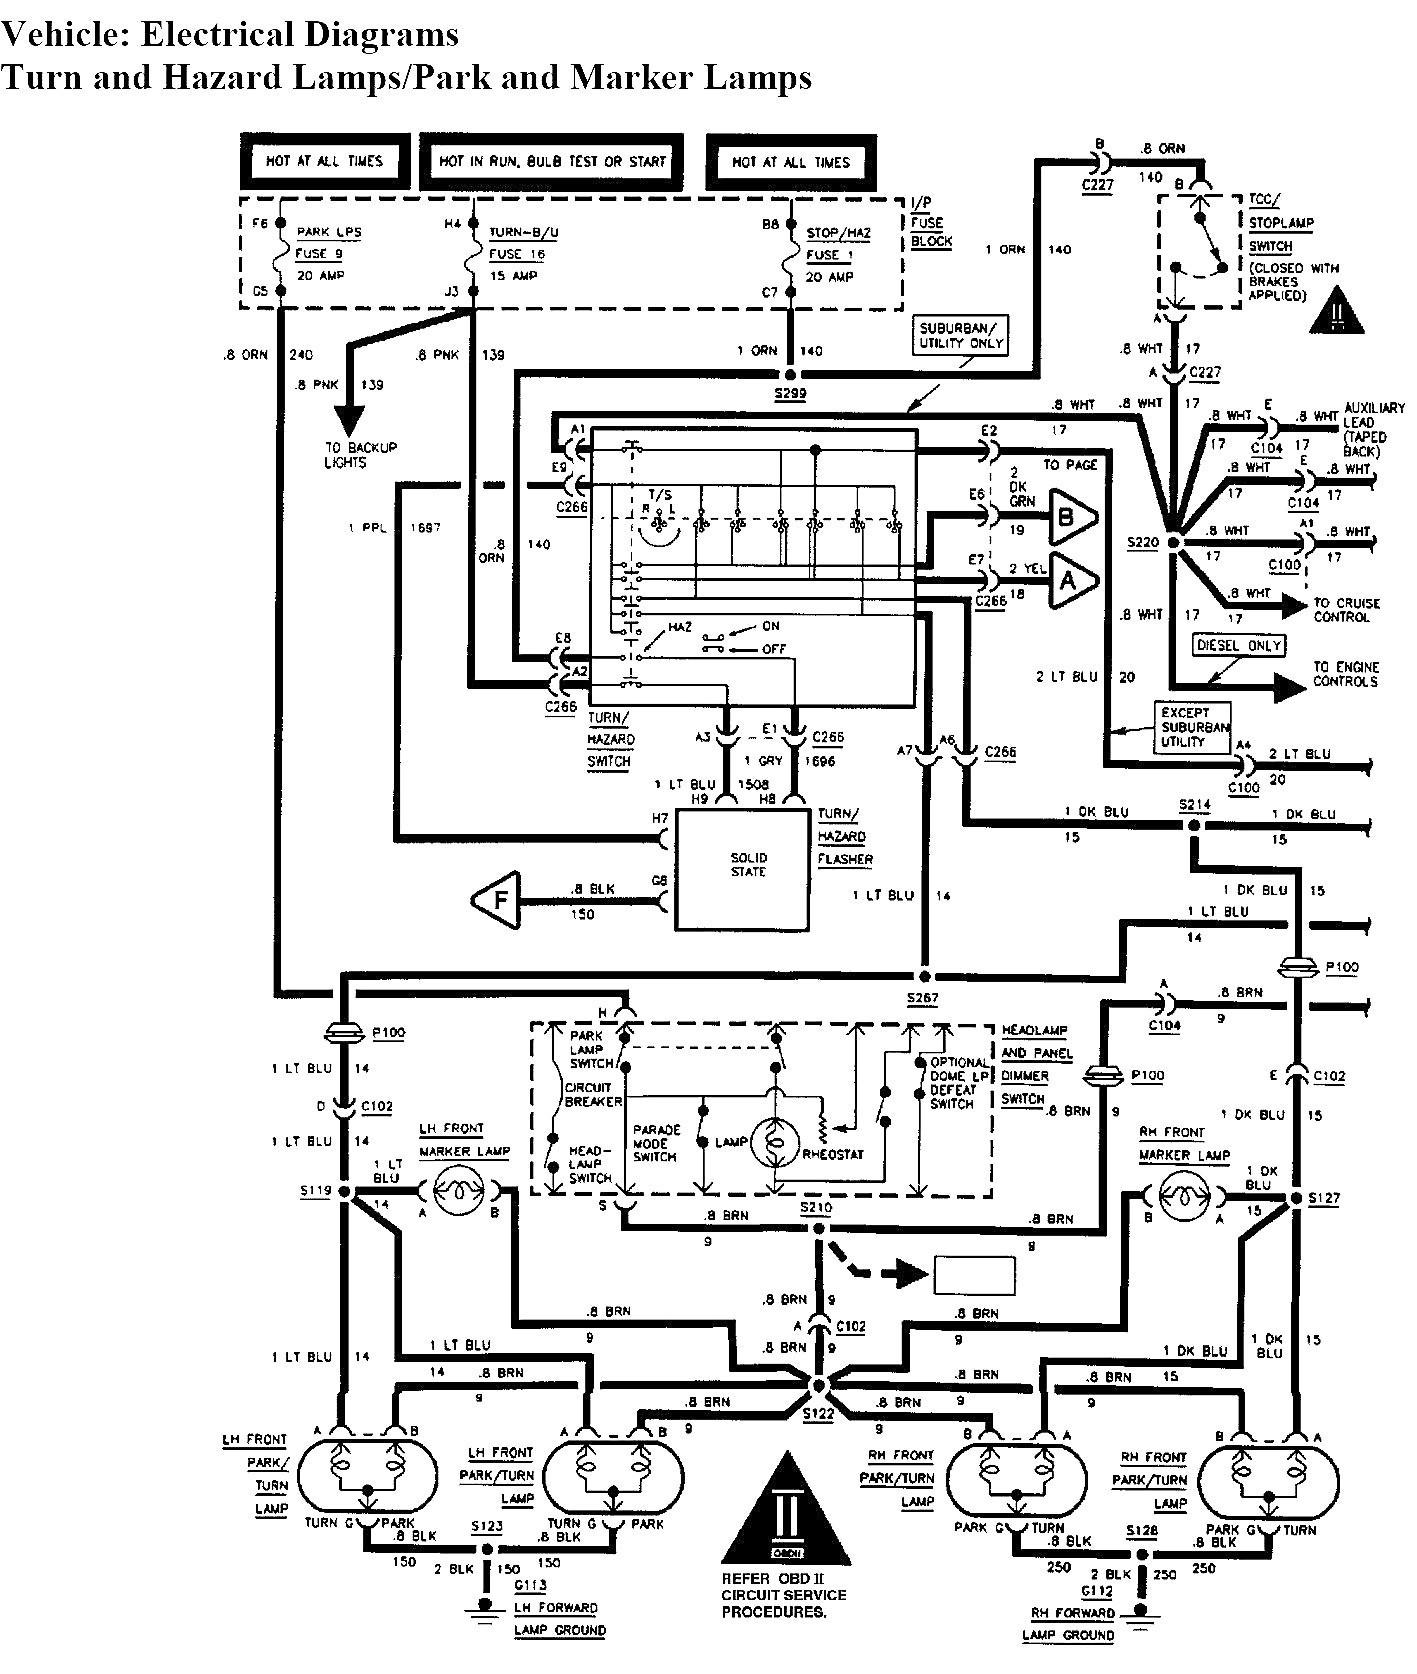 1999 chevy blazer tail light wiring diagram wire center u2022 rh masinisa co trailer tail light wiring diagram 2000 chevy s10 tail light wiring diagram